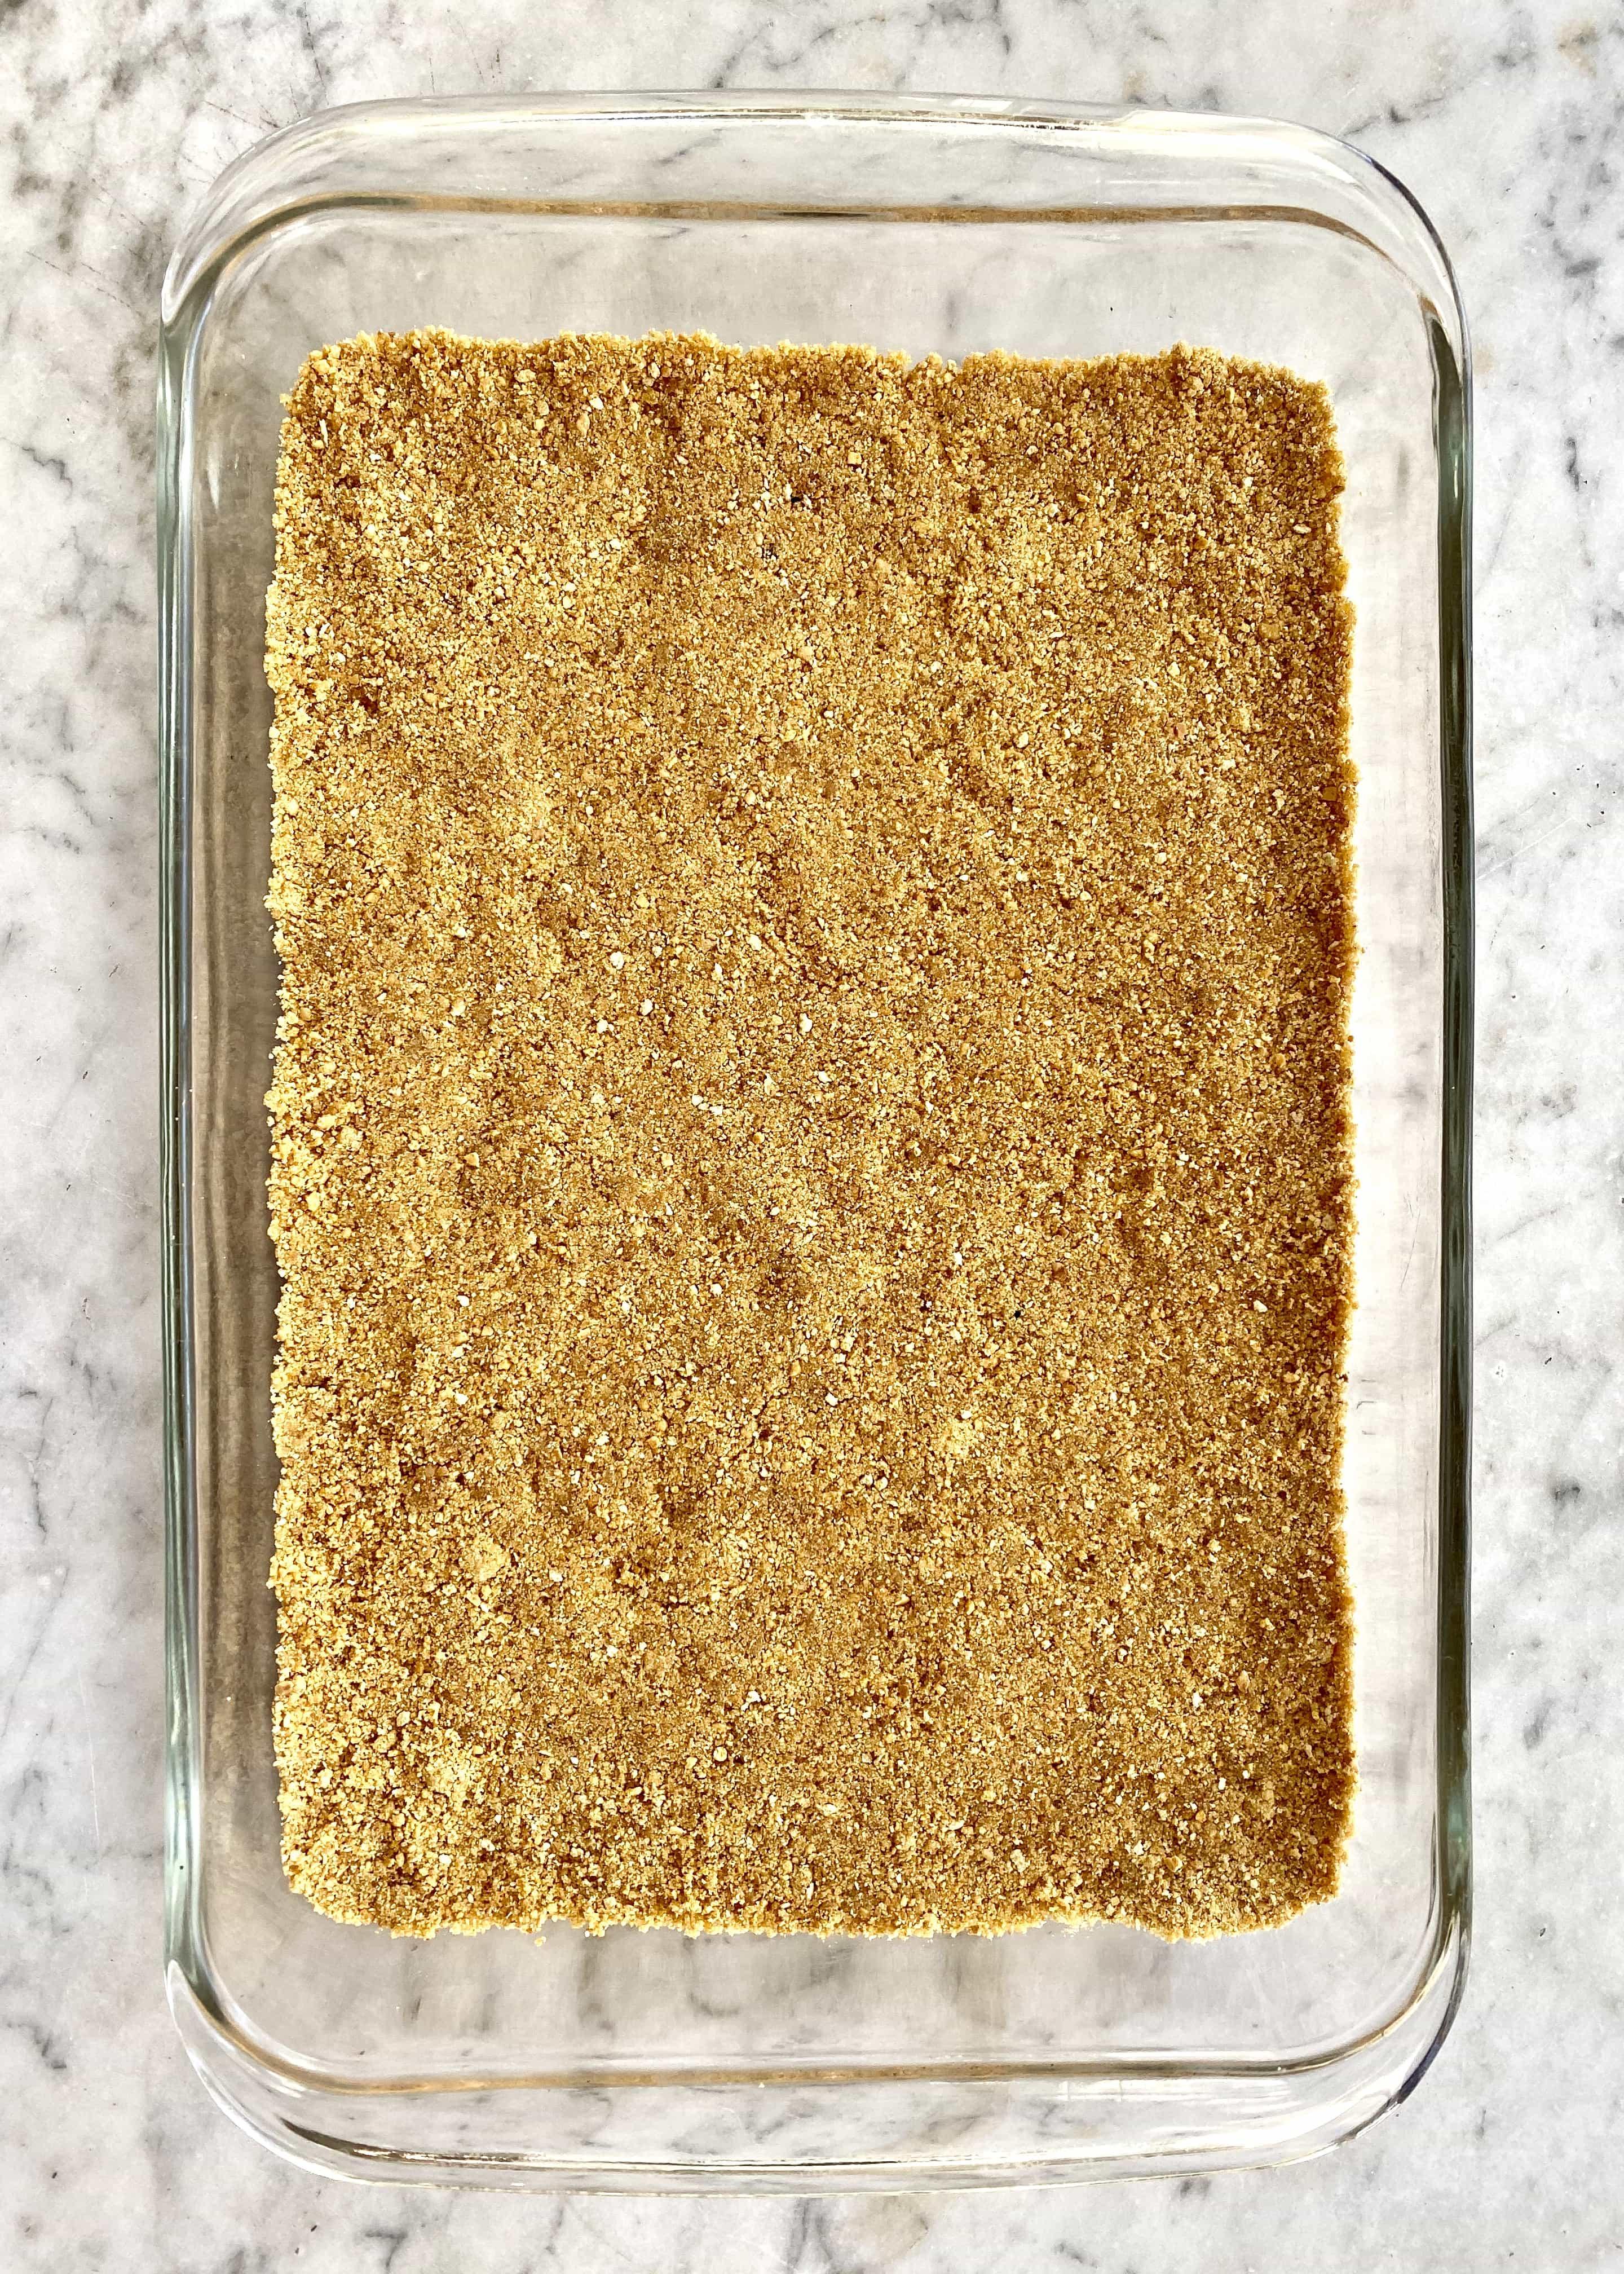 graham cracker crust in a 13 x 9 inch glass dish